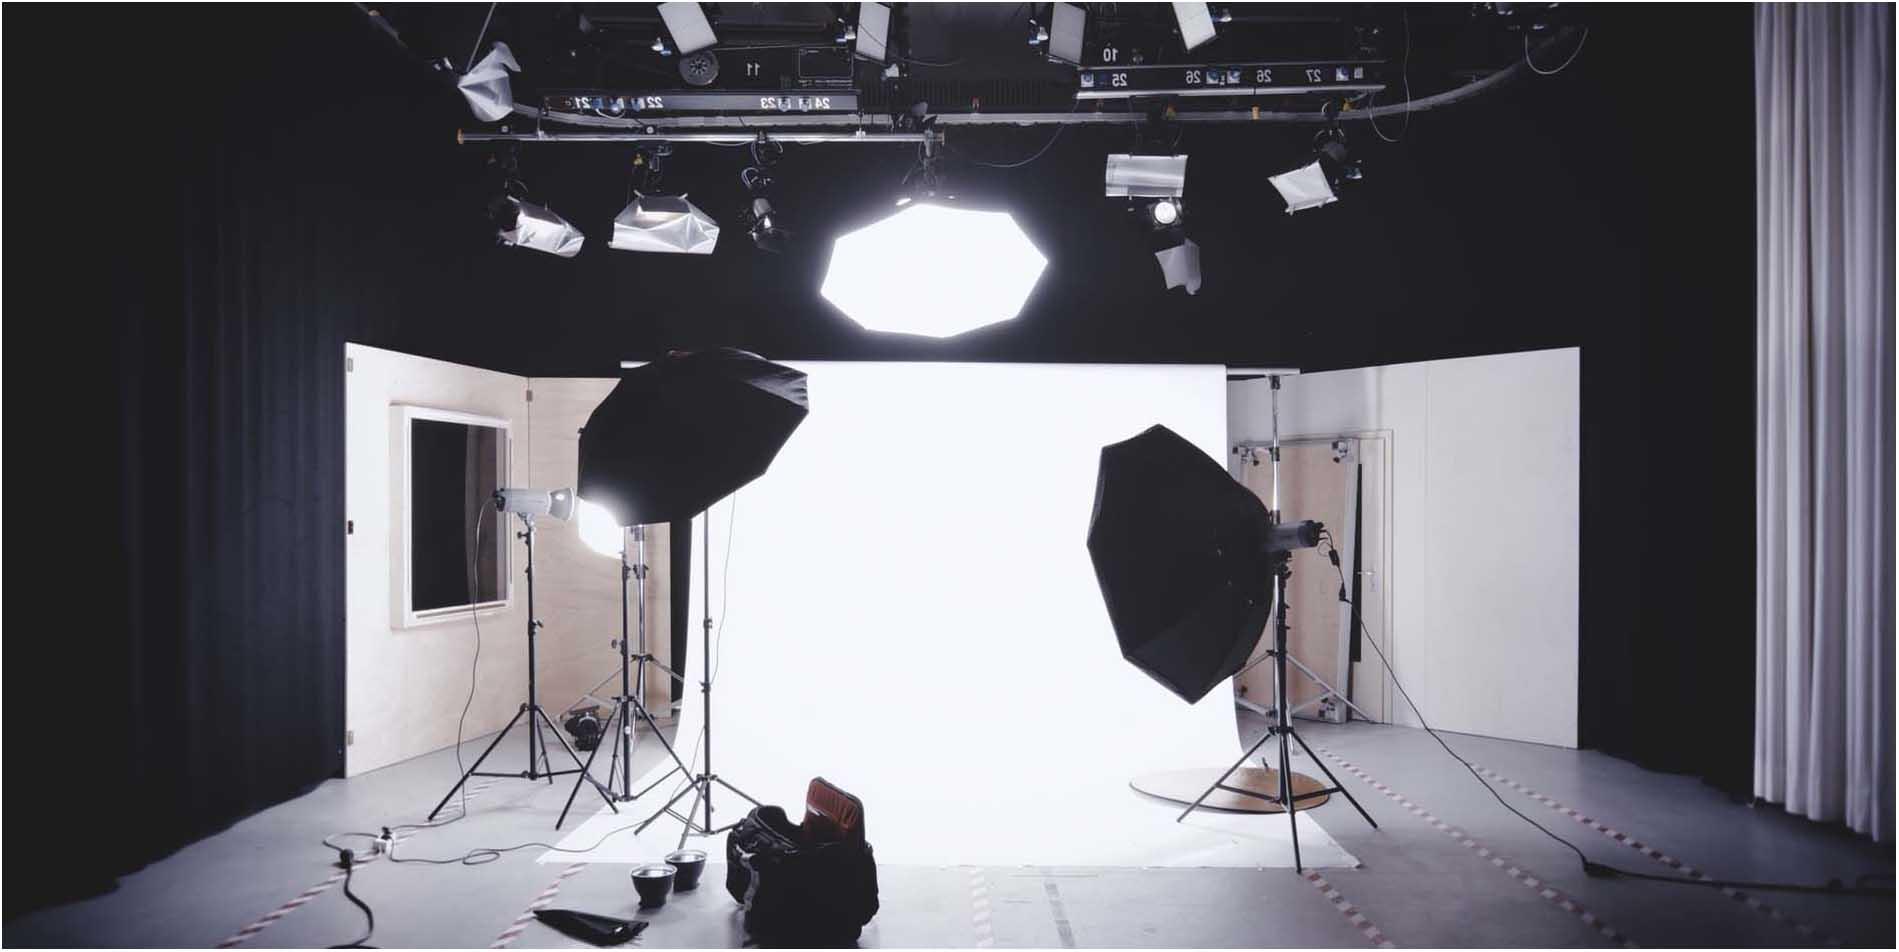 fotostudio horsens